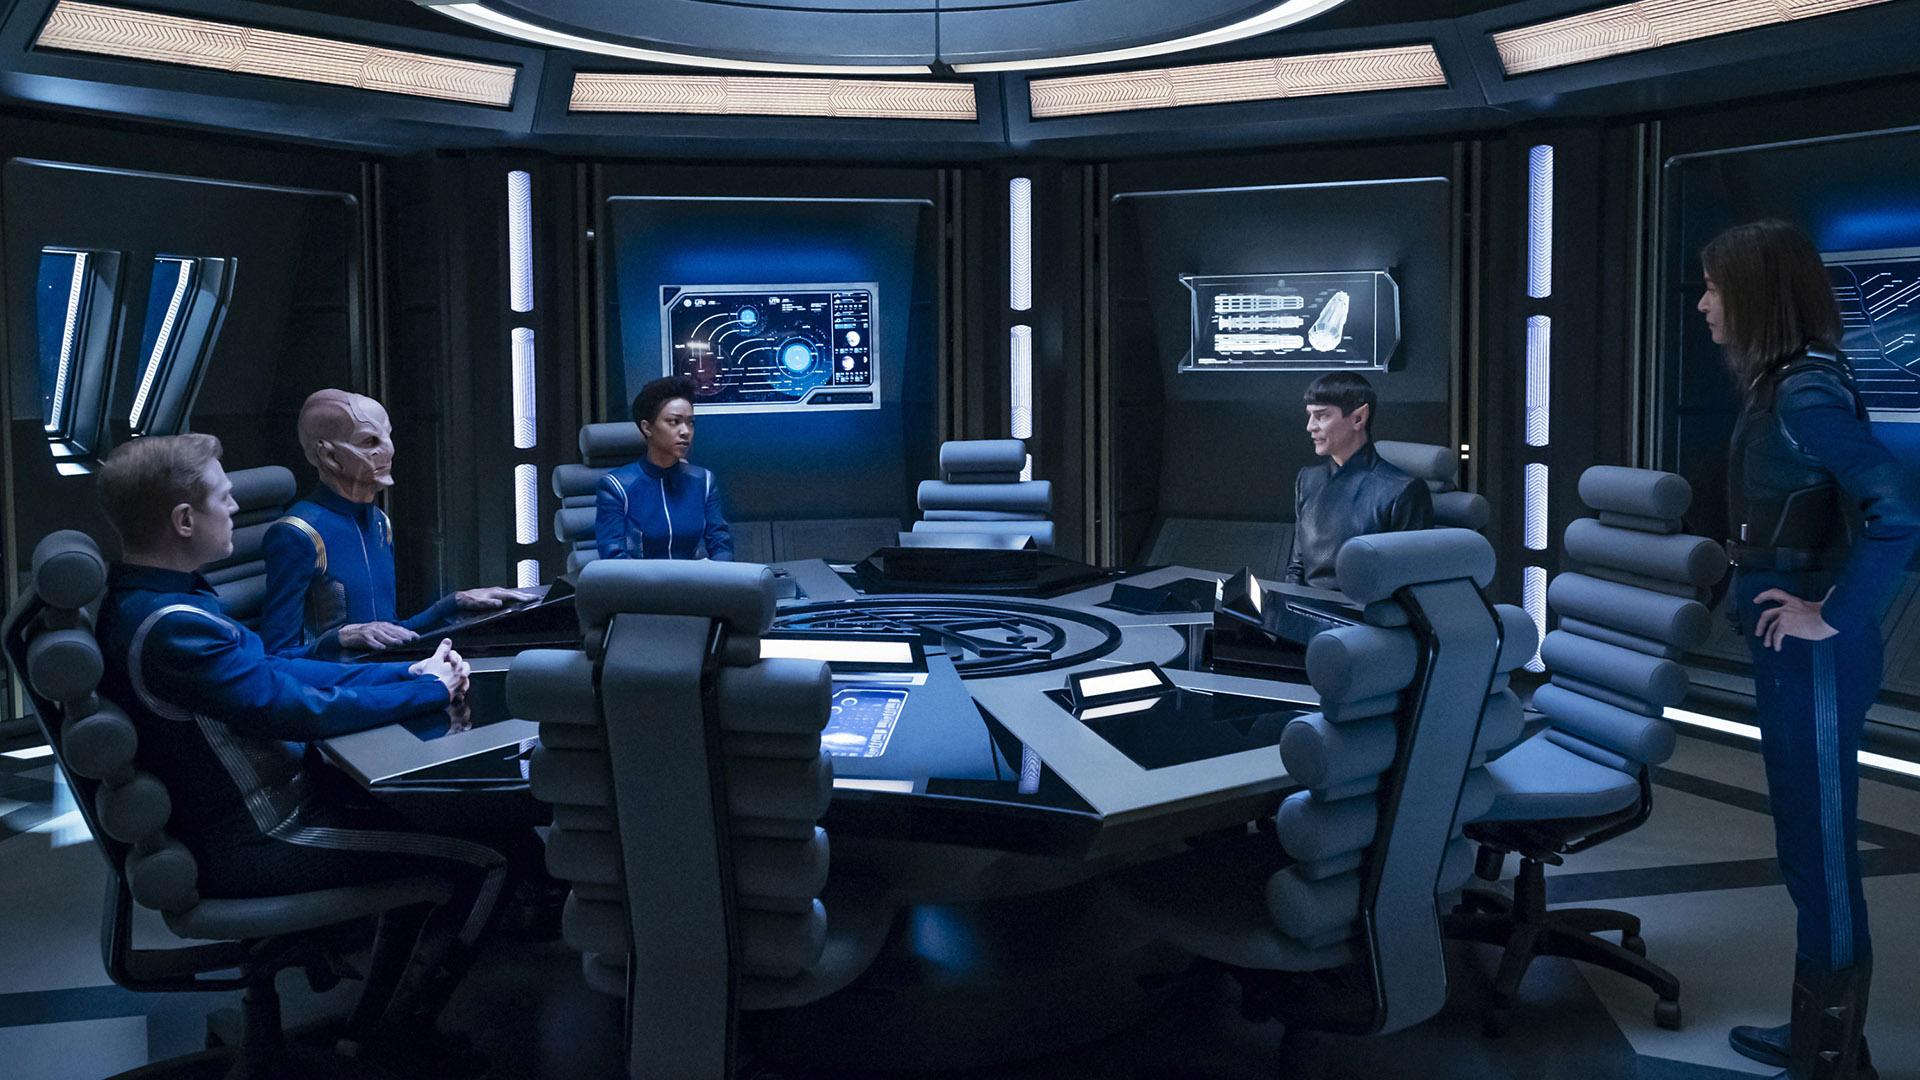 Lieutenant Paul Stamets (Anthony Rapp), First Officer Saru (Doug Jones), Michael Burnham (Sonequa Martin-Green), Ambassador Sarek (James Frain), and Admiral Cornwell (Jayne Brook)